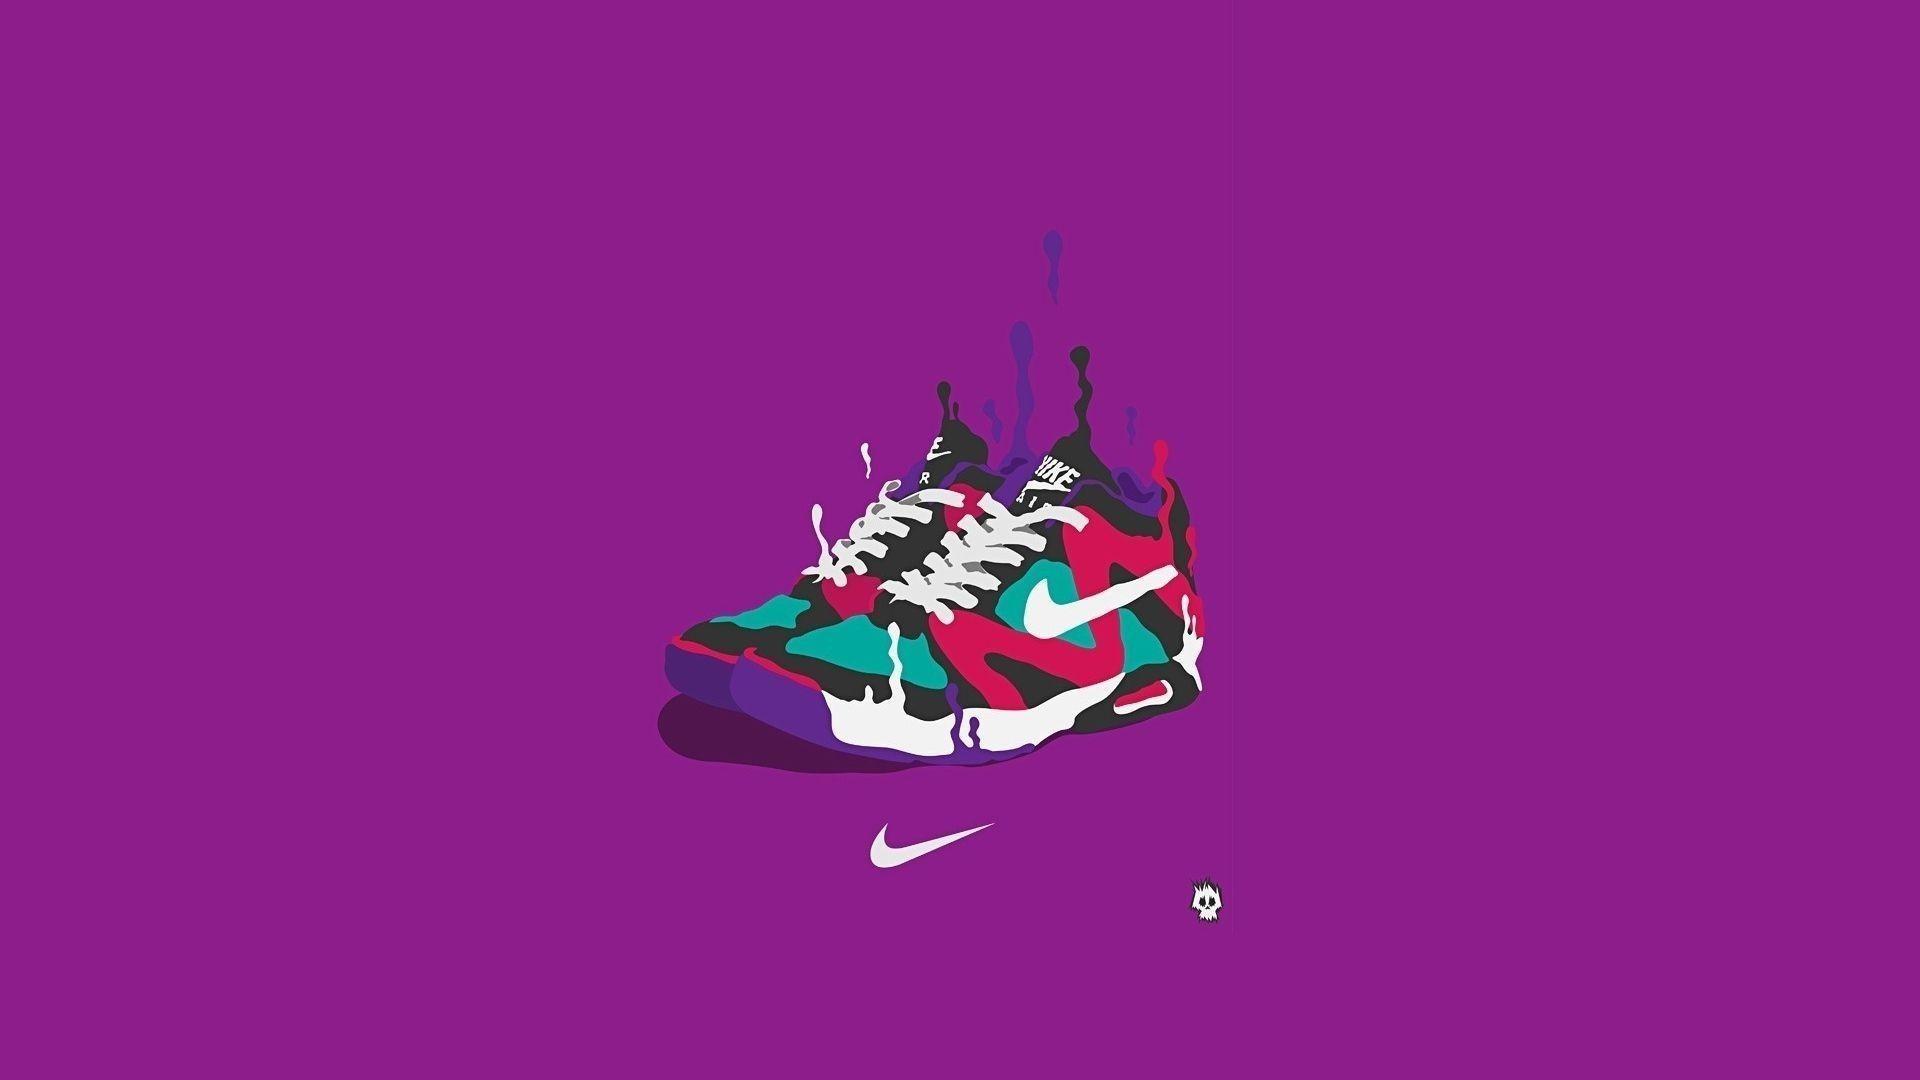 Nike Logo Wallpaper HD 2018 (64+ images)